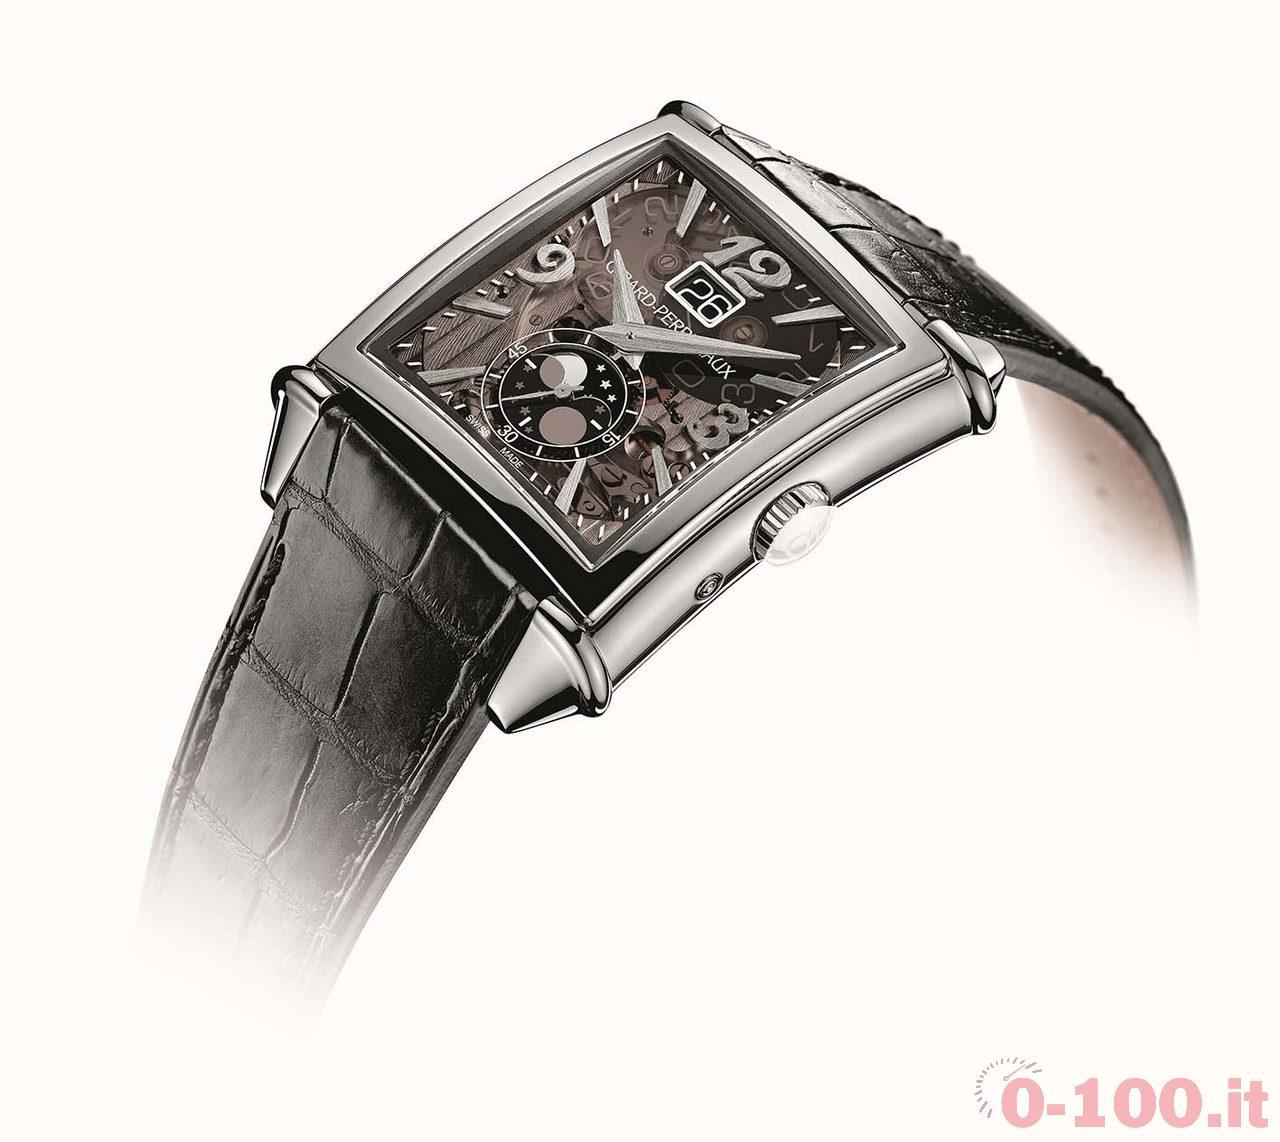 girard-perregaux-vintage-1945-gran-data-ref-25882-11-223-bb6b-ref-25882-52-222-bb6b-prezzo-price-0-100_5